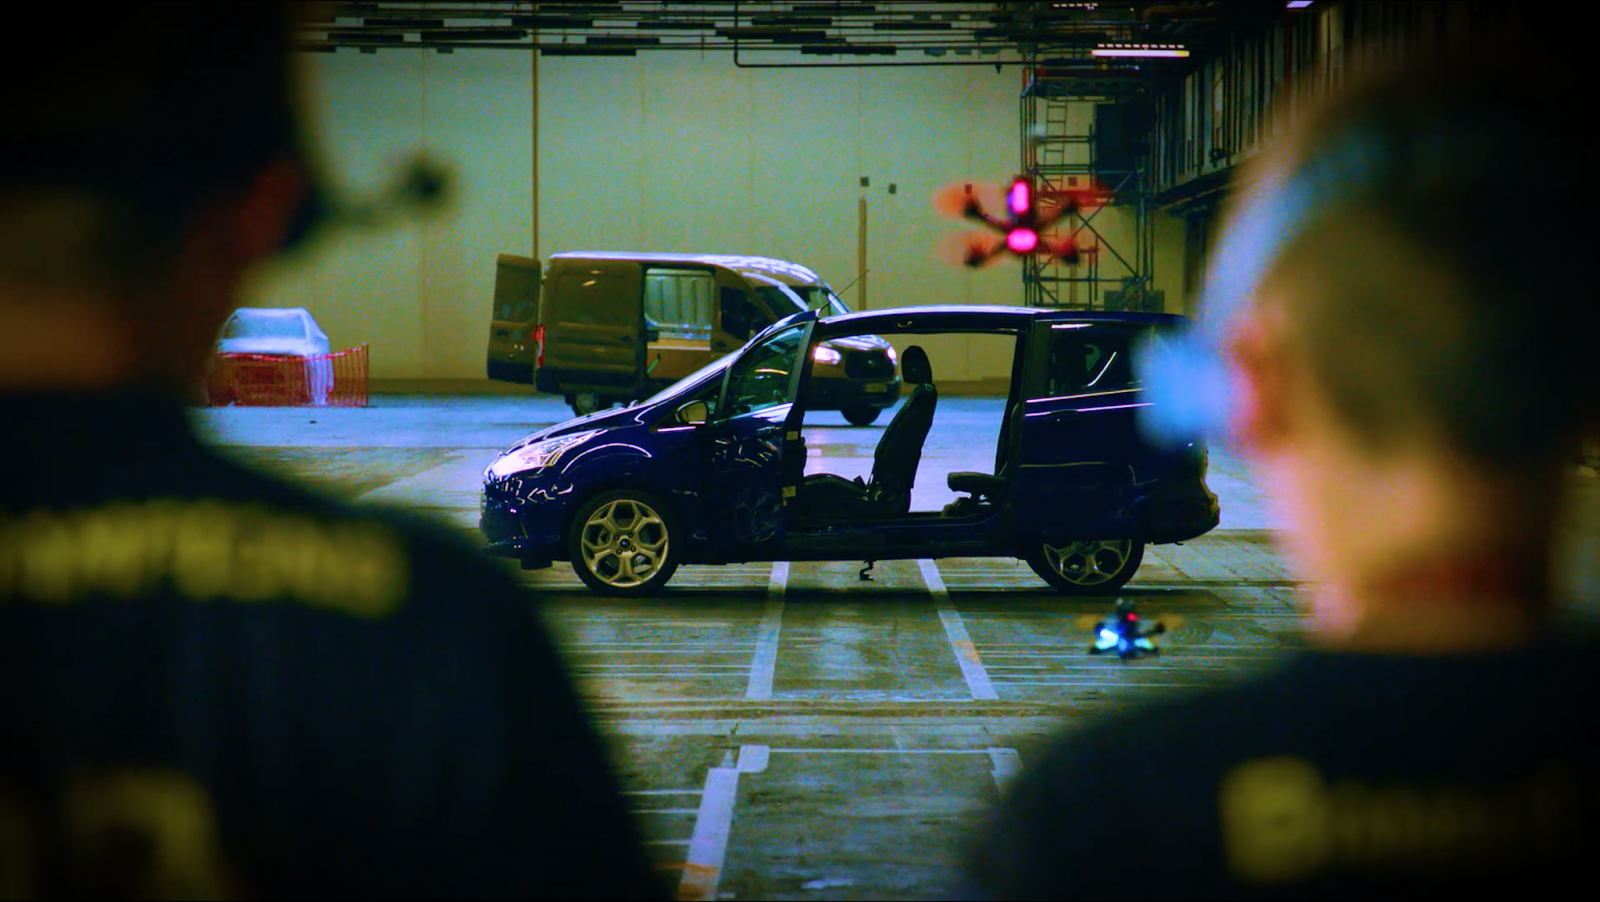 FordDronekhana screenshots 10 Το Gymkhana των Drones drift, Drone, Dronekhana, Ford, Ford Focus, Ford Focus RS, Ford Mustang, Ford Mustang GT, Fun, videos